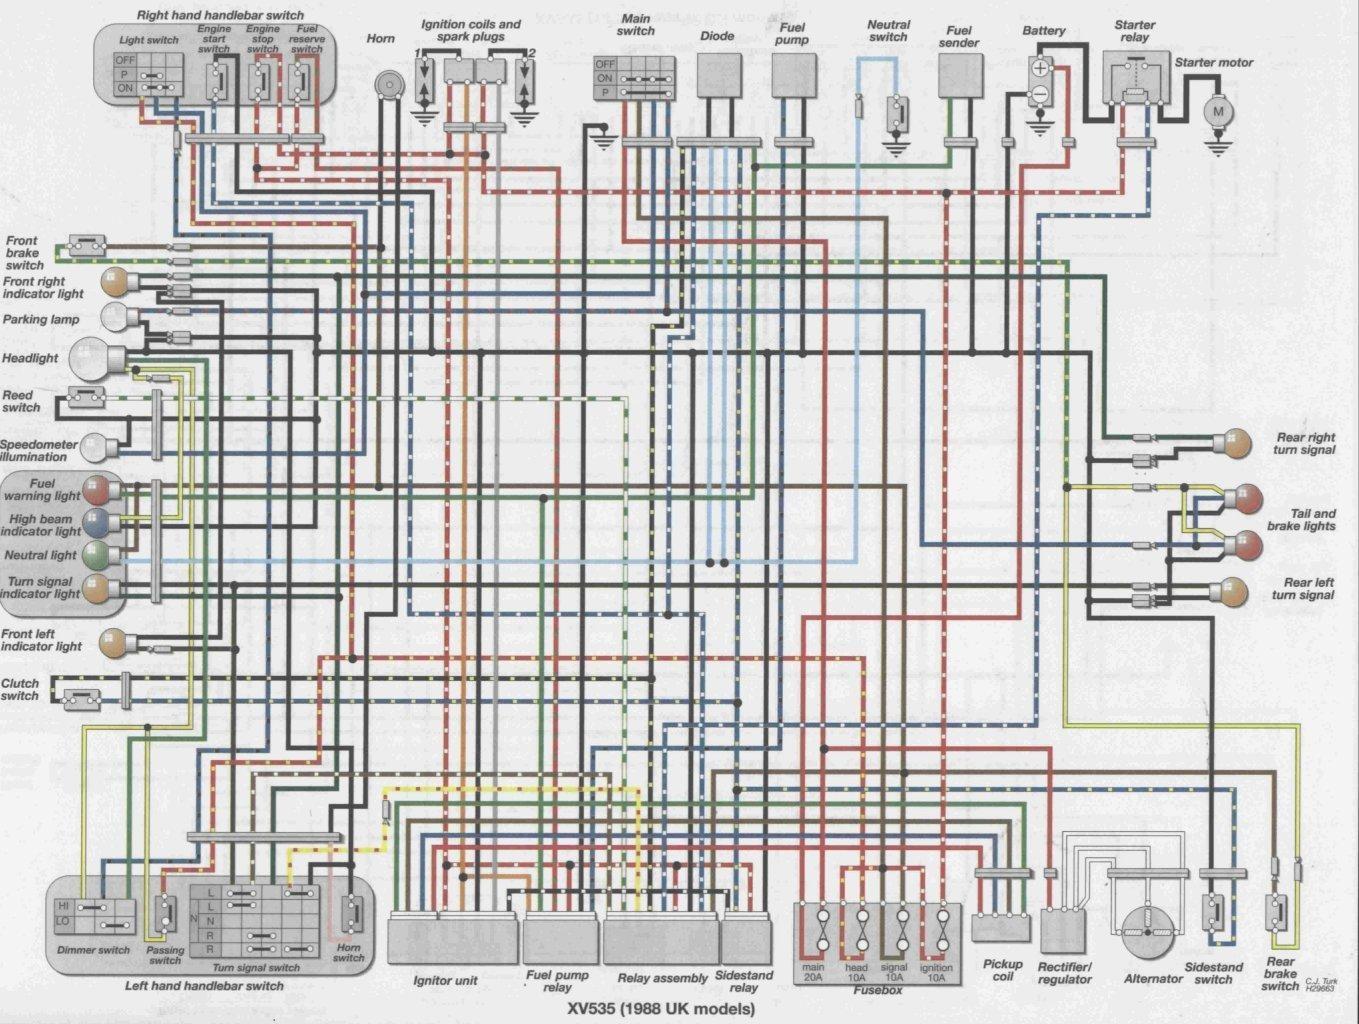 88-uk-xv535 Xs Wiring Diagram on